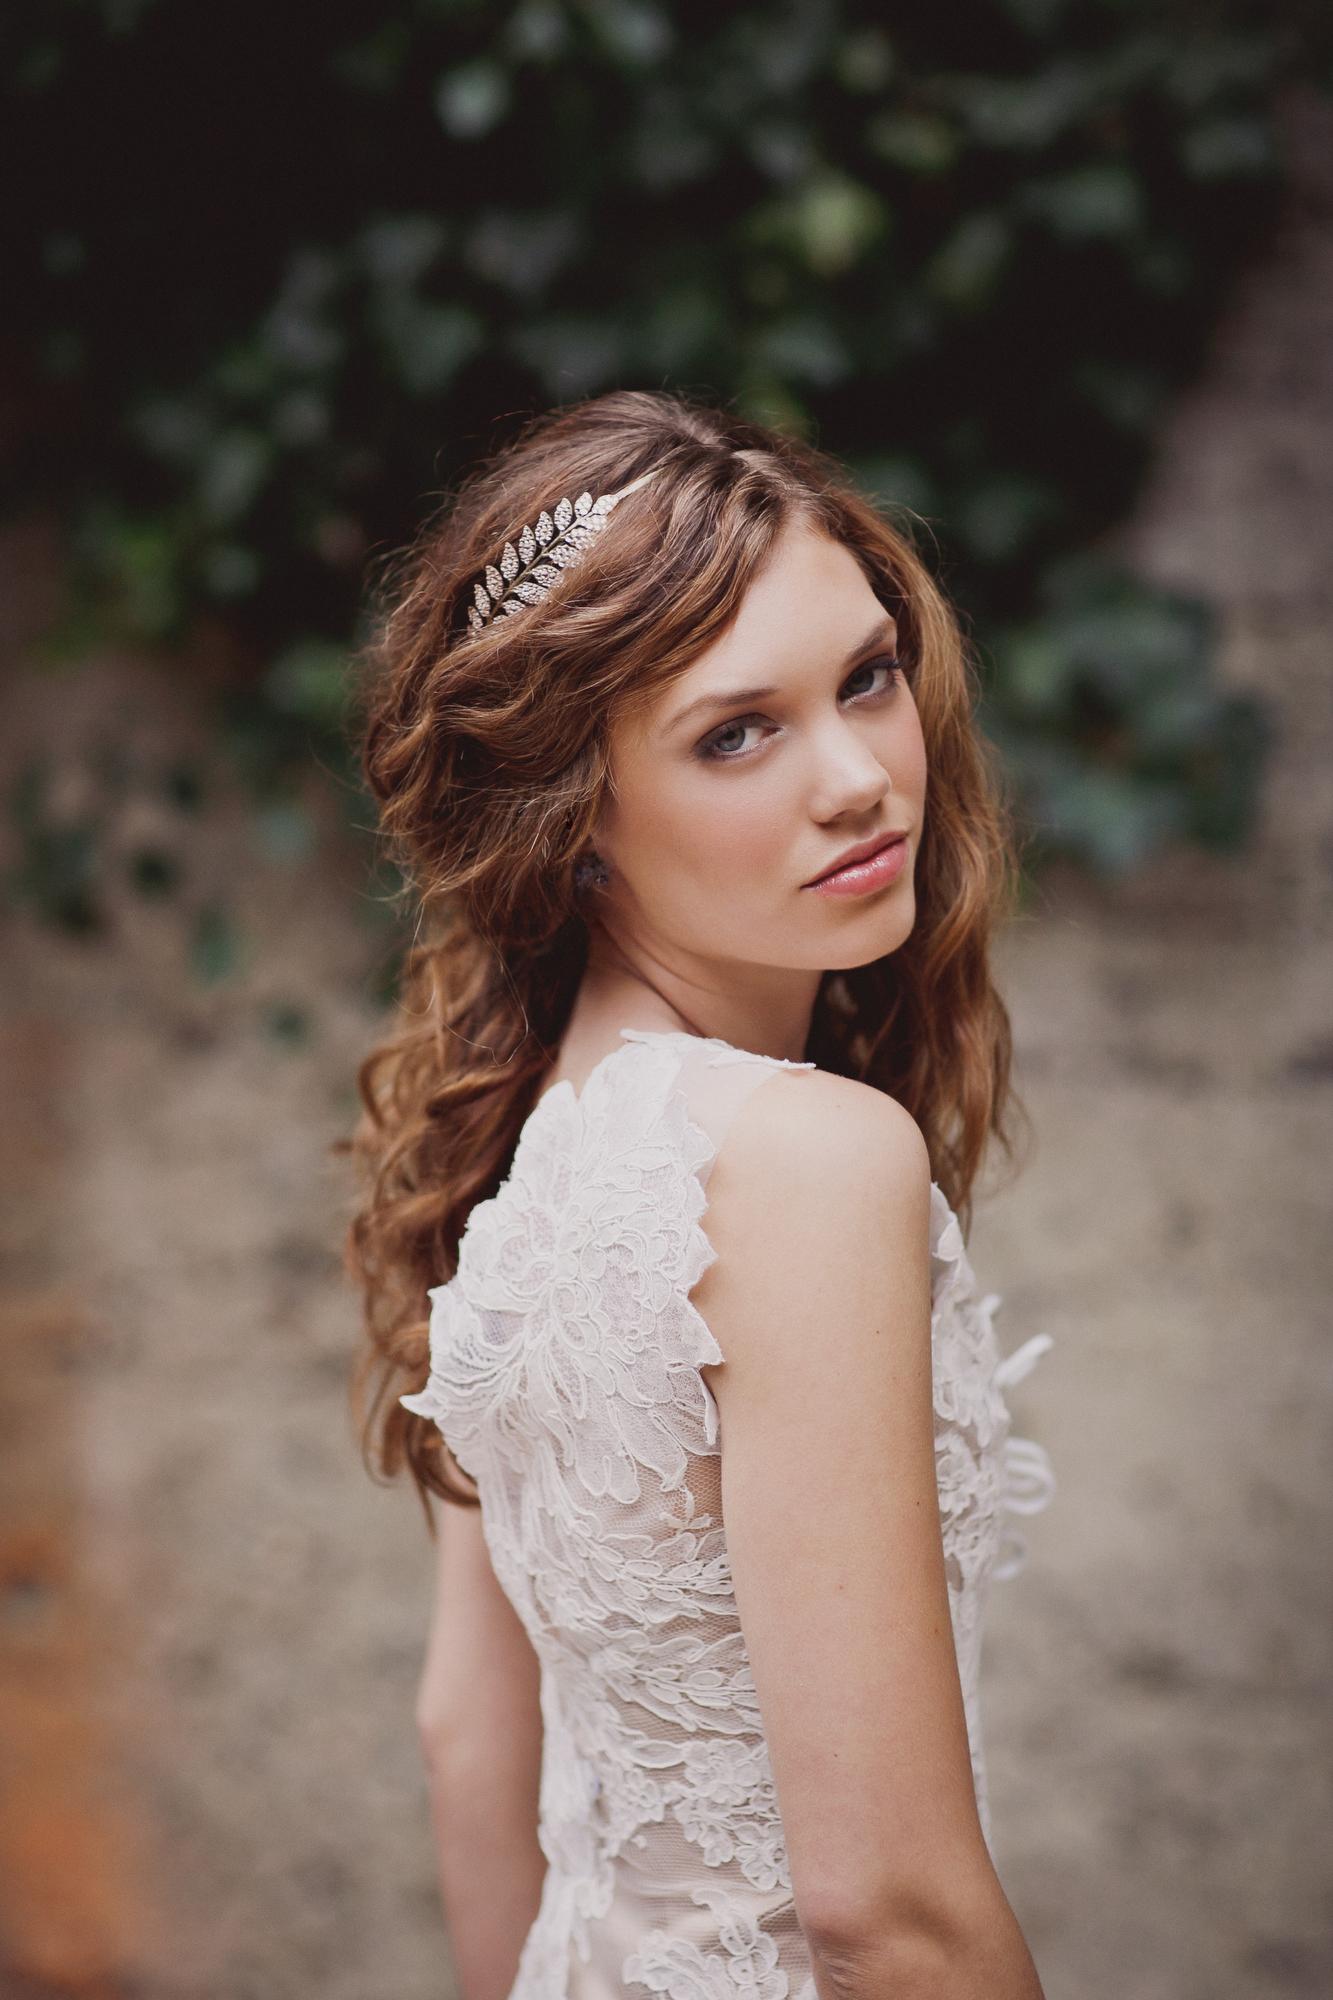 jennifer-skog-bridal-fashion-photographer-lifestyle-0006.jpg